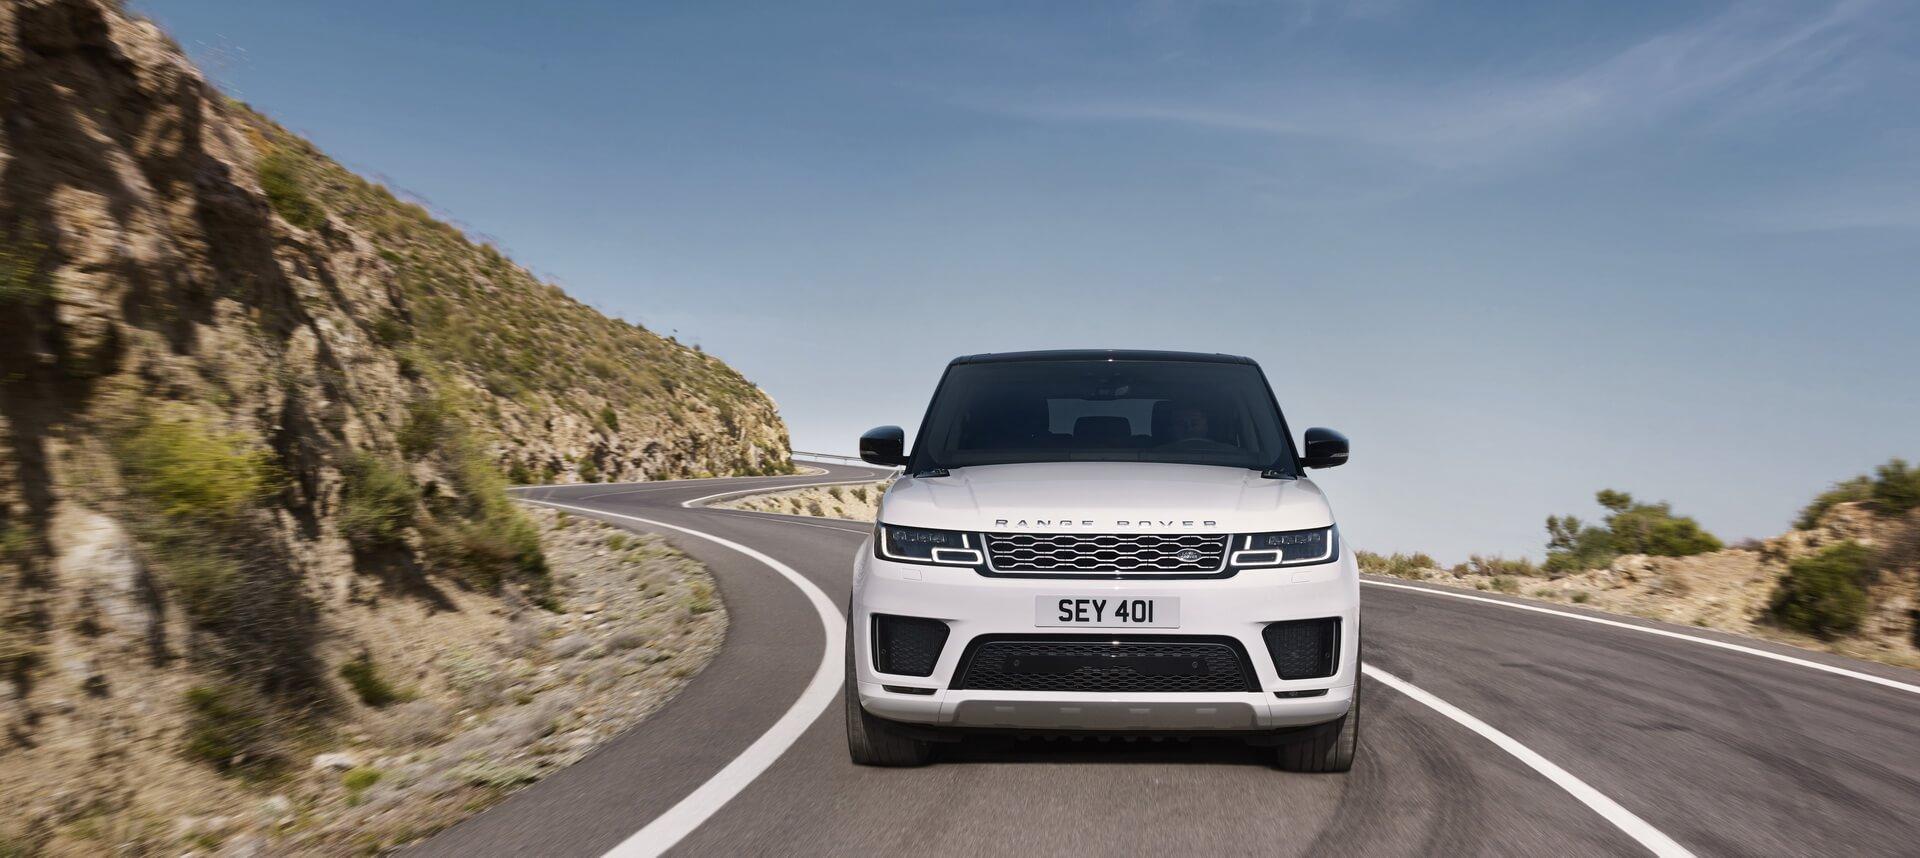 Фотография экоавто Range Rover Sport plug-in hybrid P400e